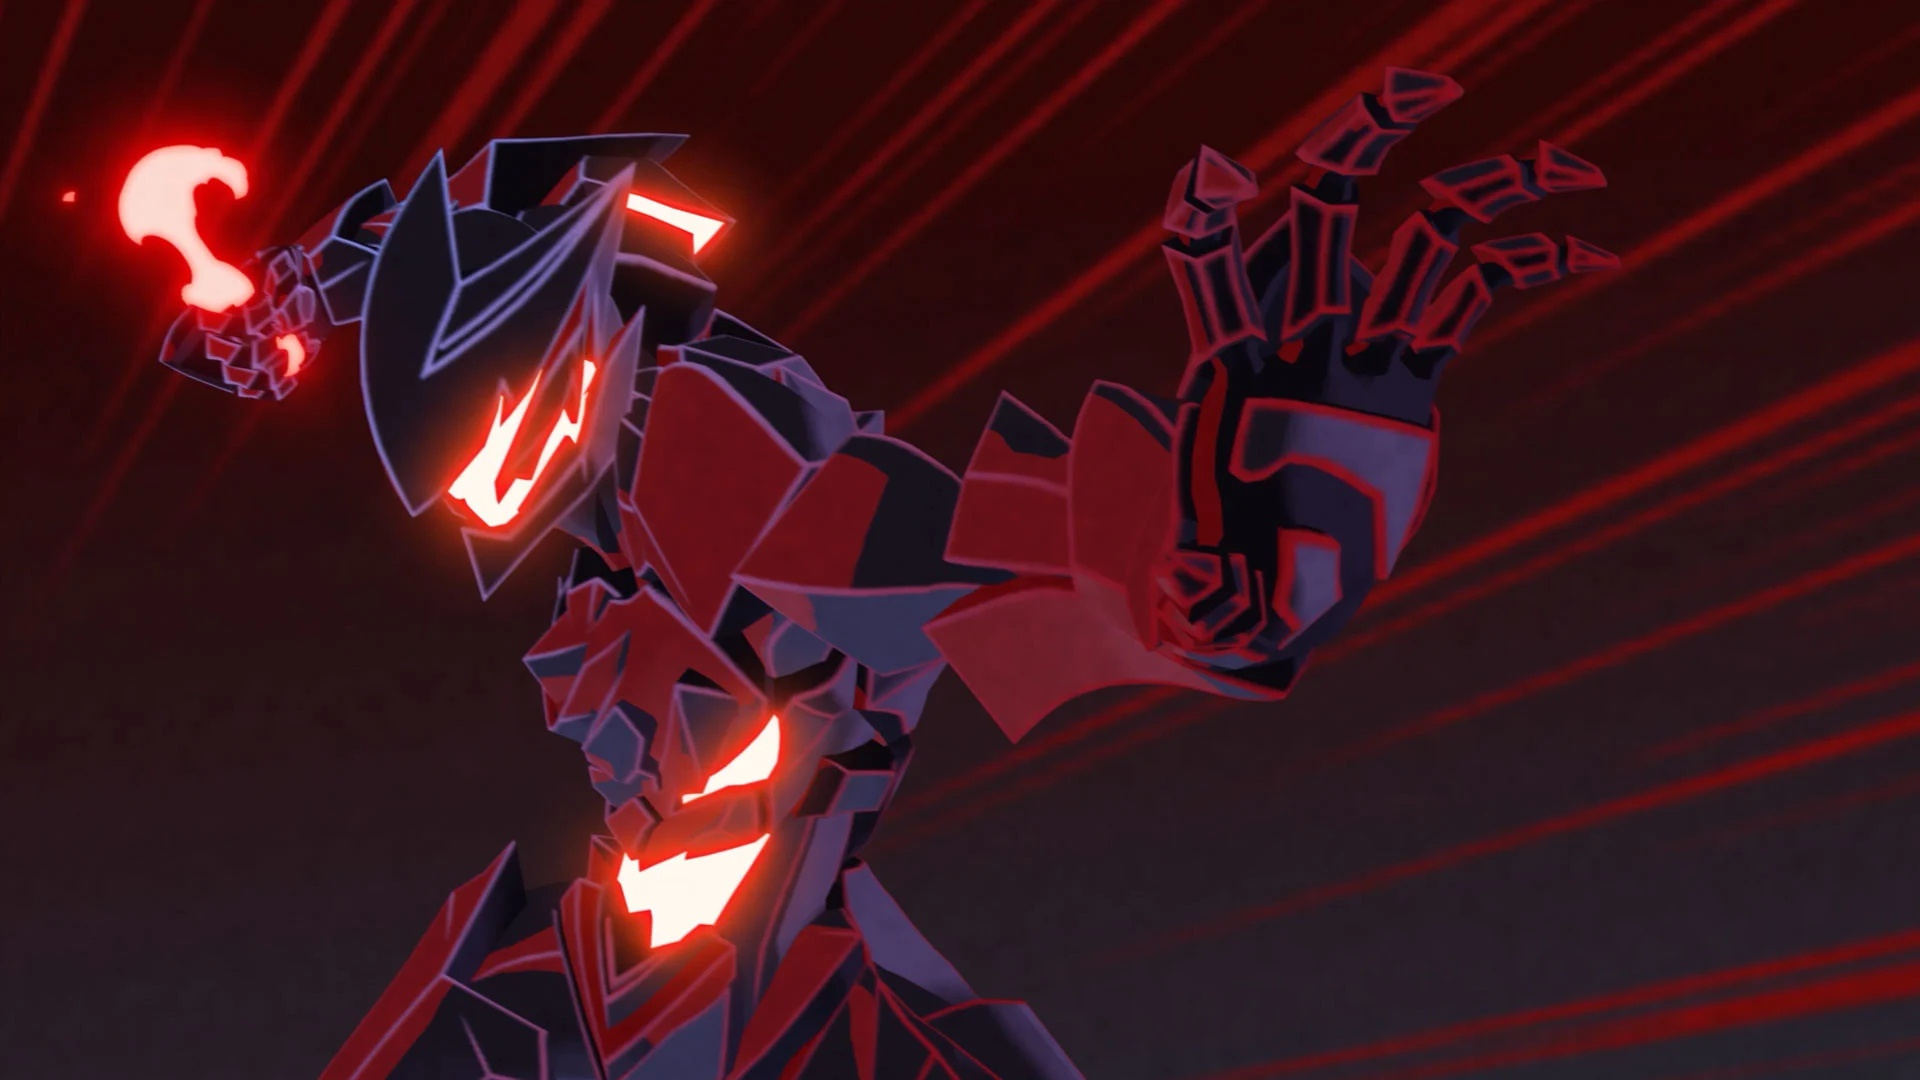 Focus Home изучает скандал вокруг Aeon Must Die! и студии Limestone Games